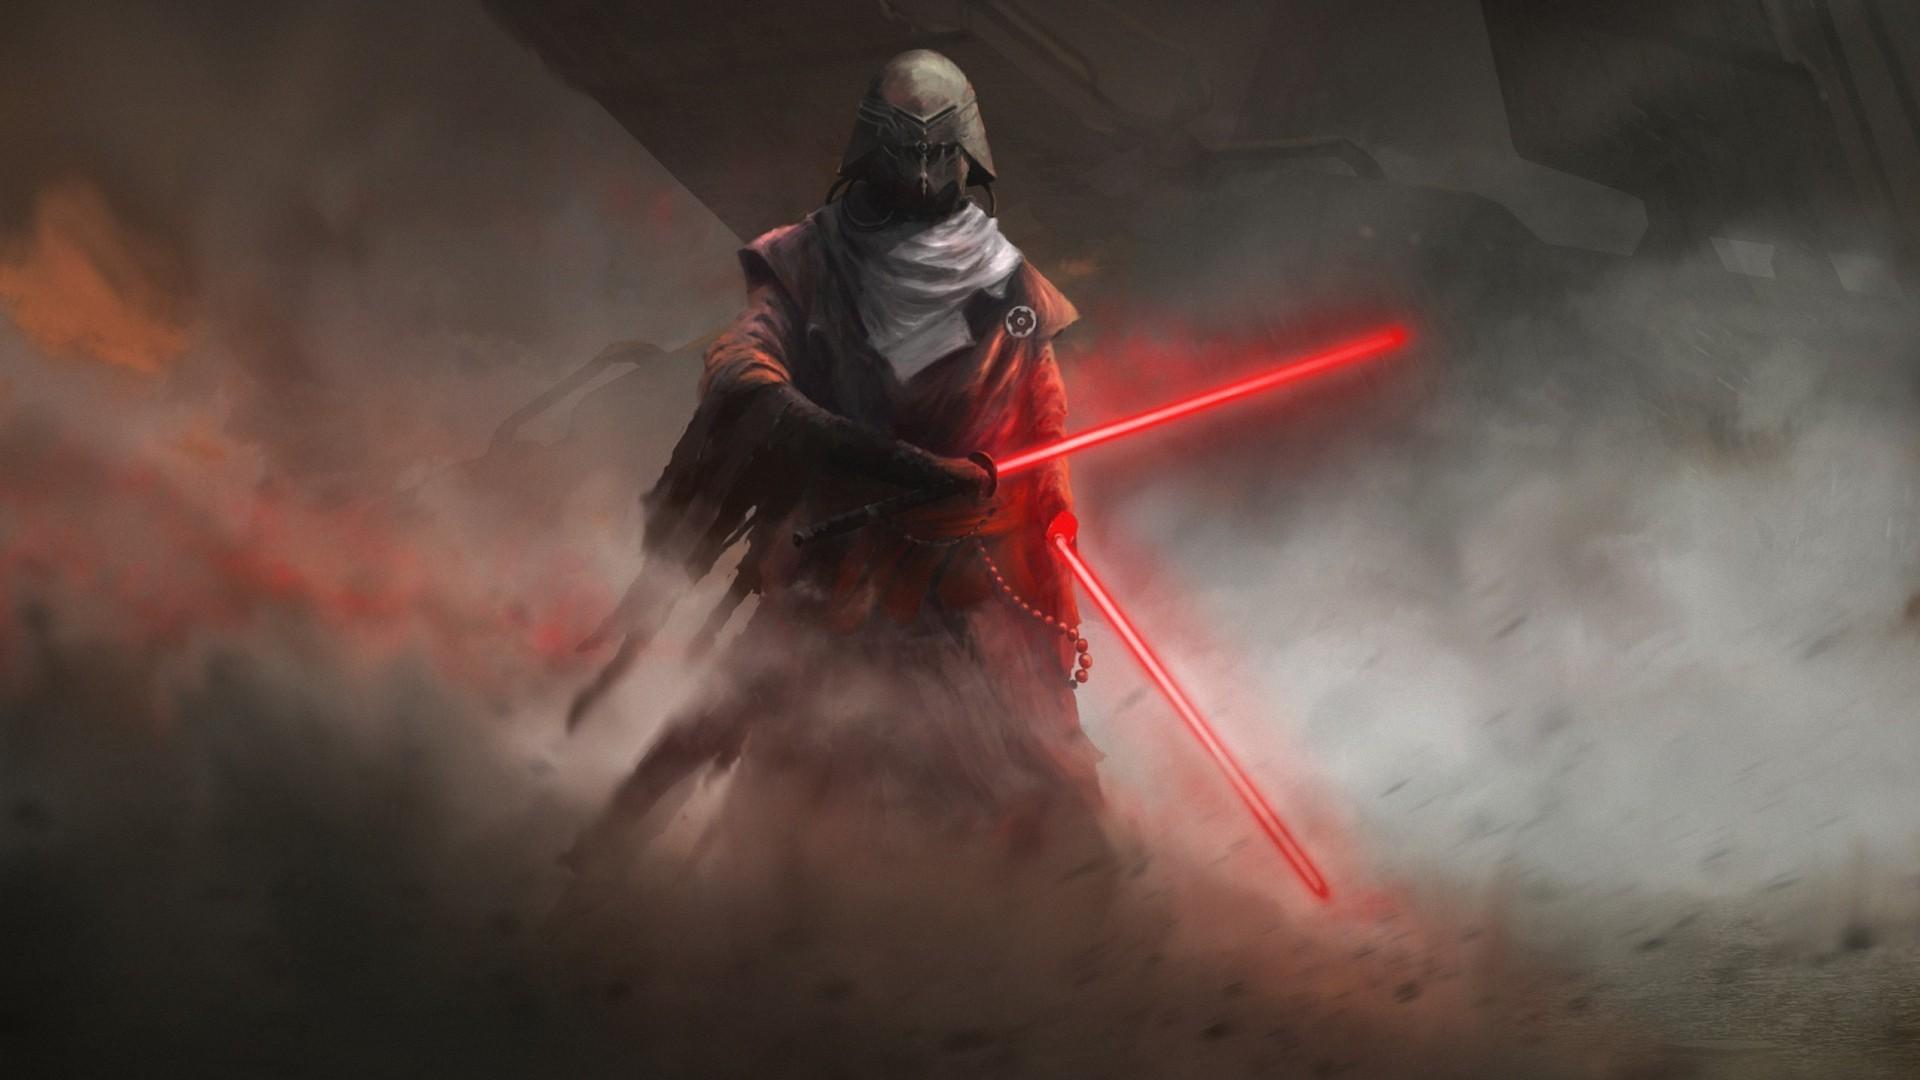 fantasy star wars lightsaber sith 1080P full HD wallpapers